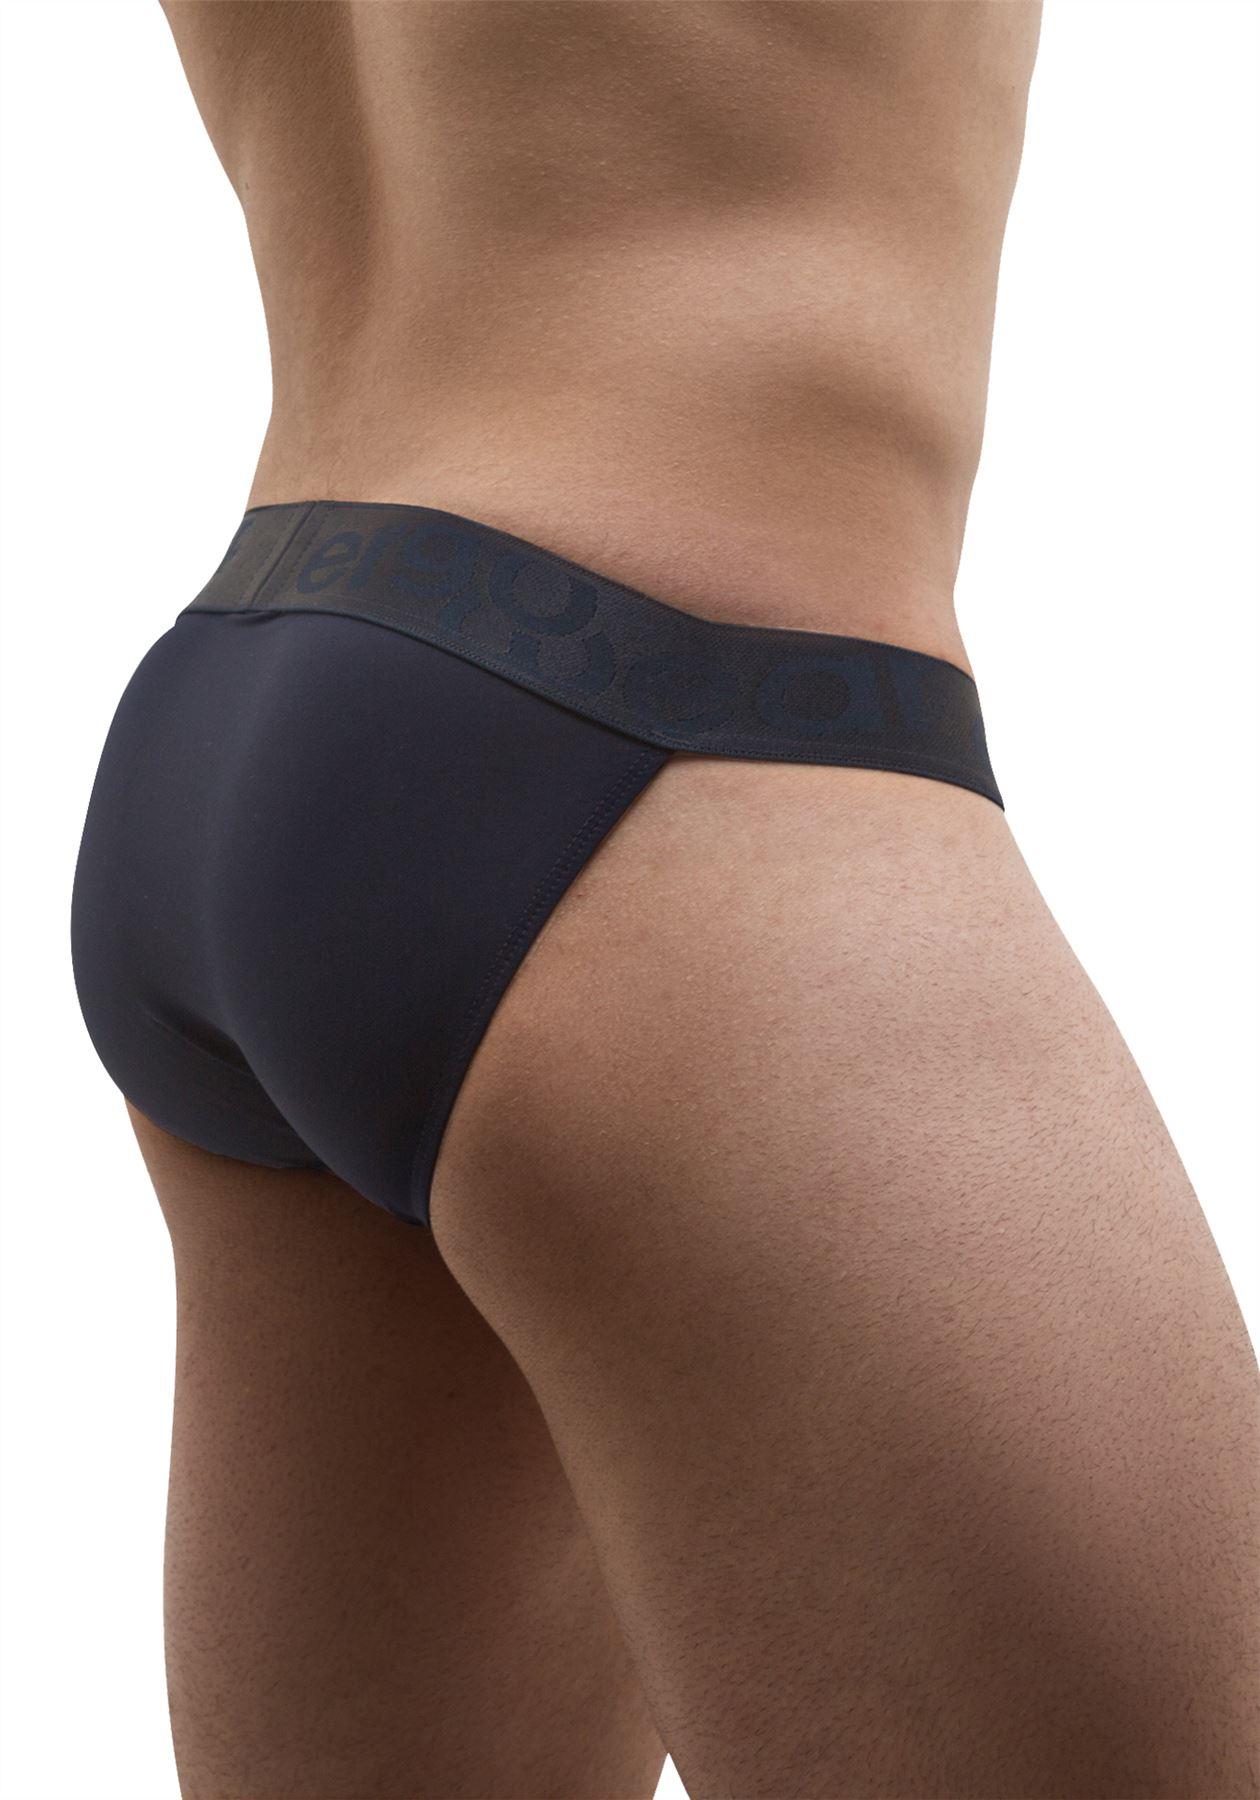 Ergowear Max XV Bikini anatomico sostegno Tanga Biancheria Intima Breve Pantaloni